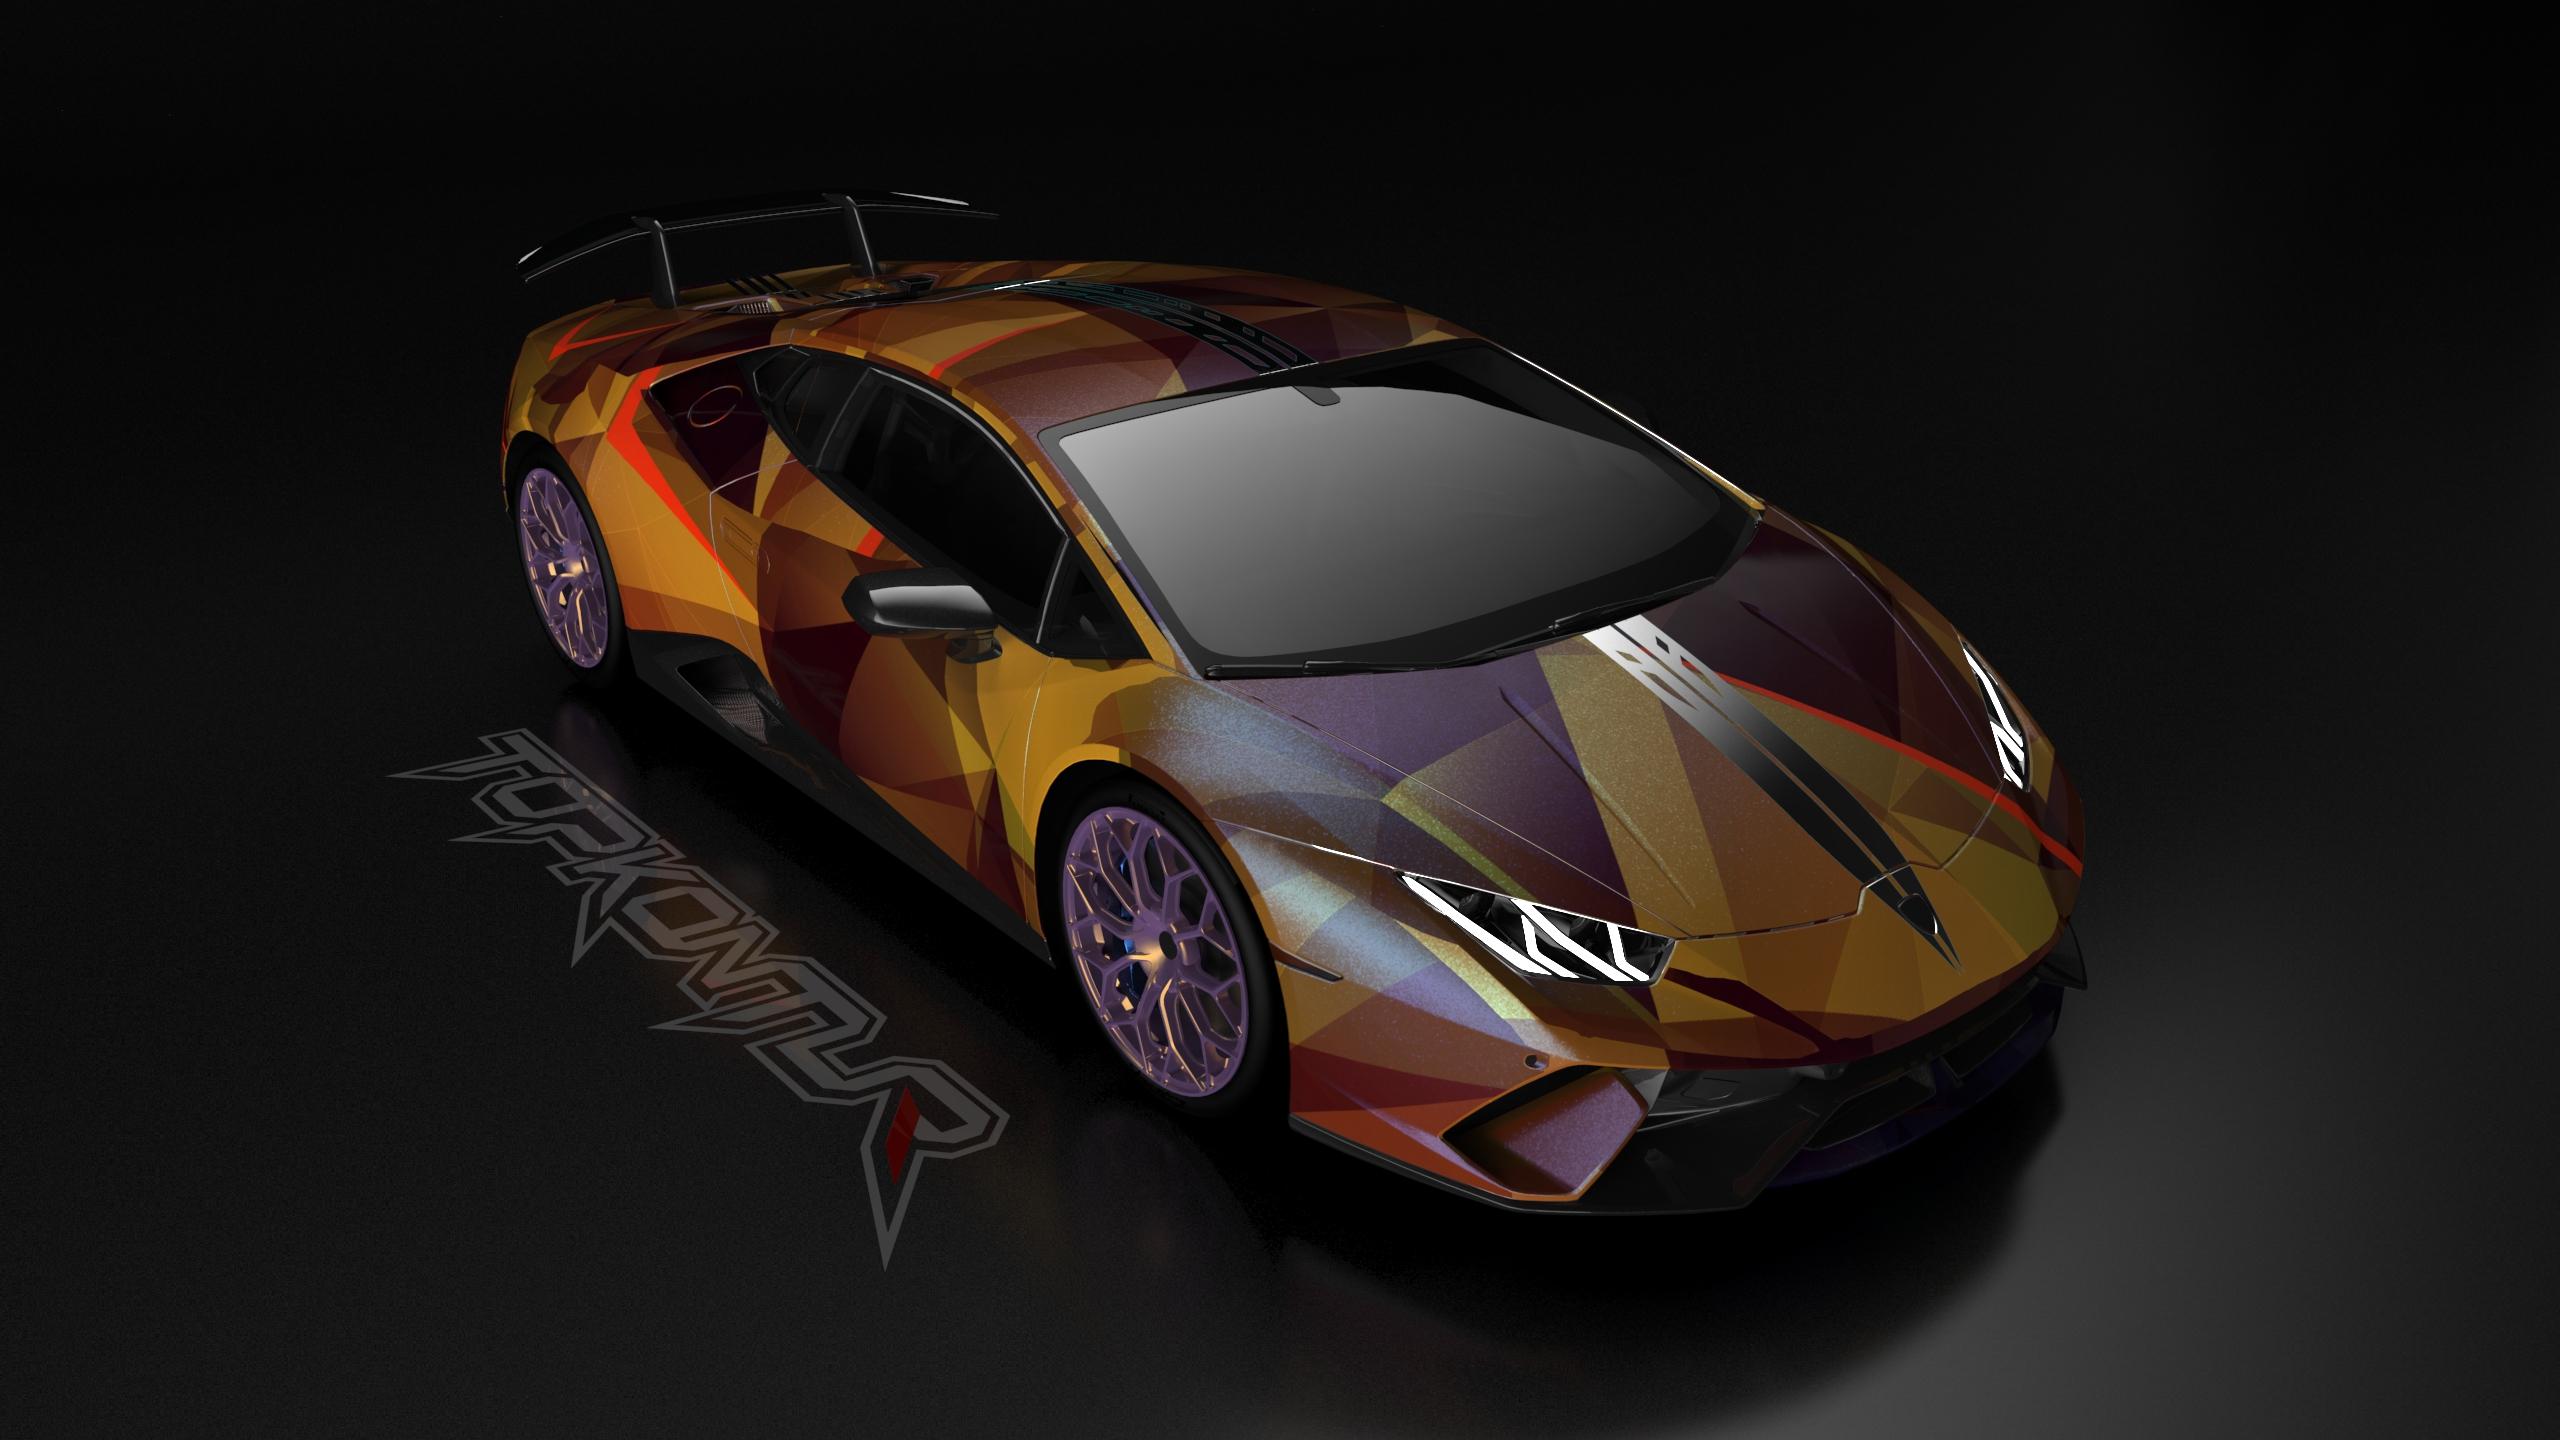 Gold And Wine Lamborghini Huracan, HD Cars, 4k Wallpapers ...